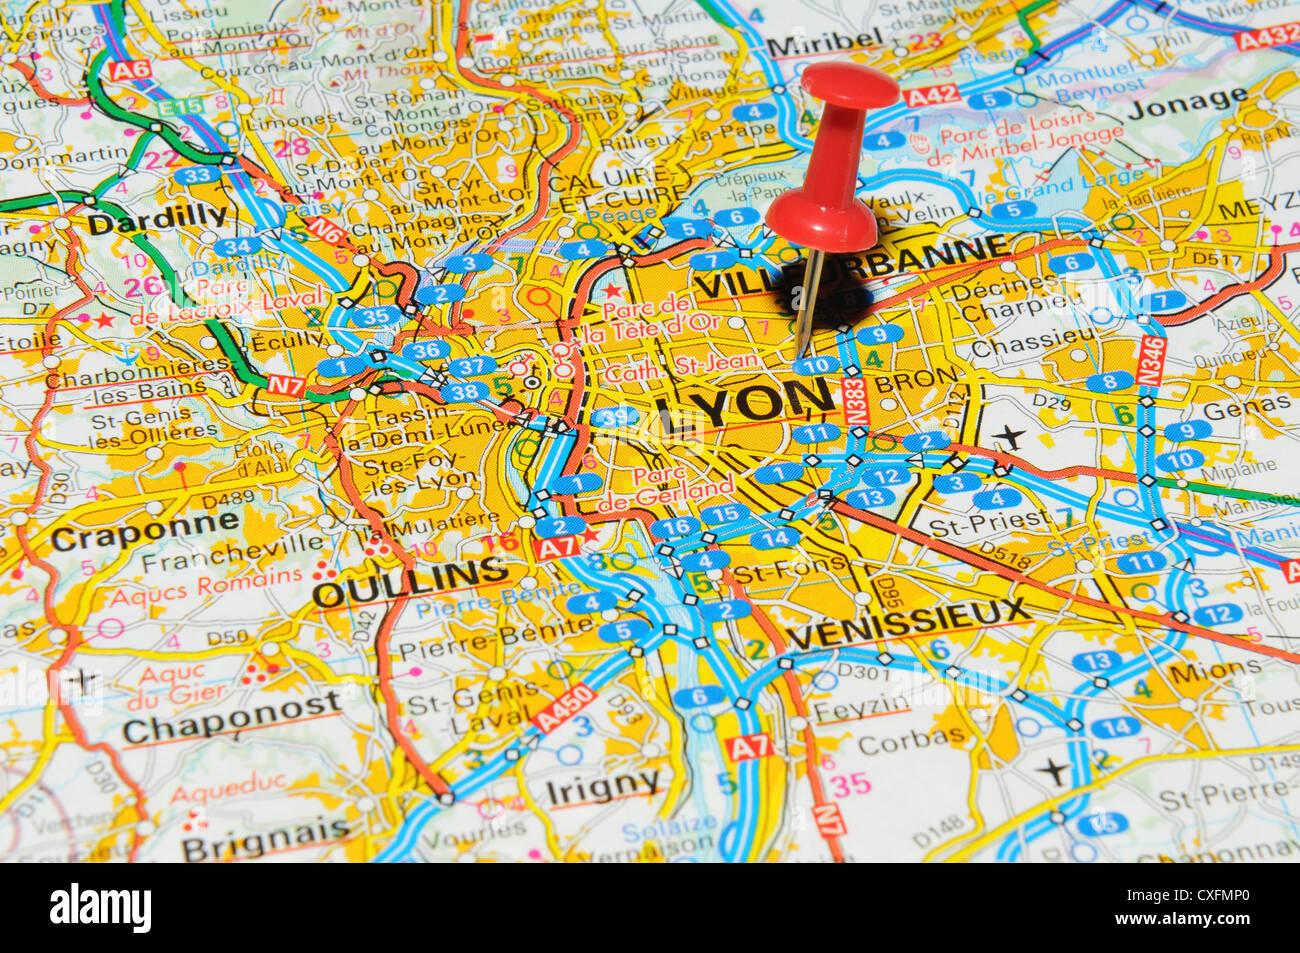 Lyon Karte.Lyon Frankreich Auf Karte Stockfoto Bild 50747368 Alamy